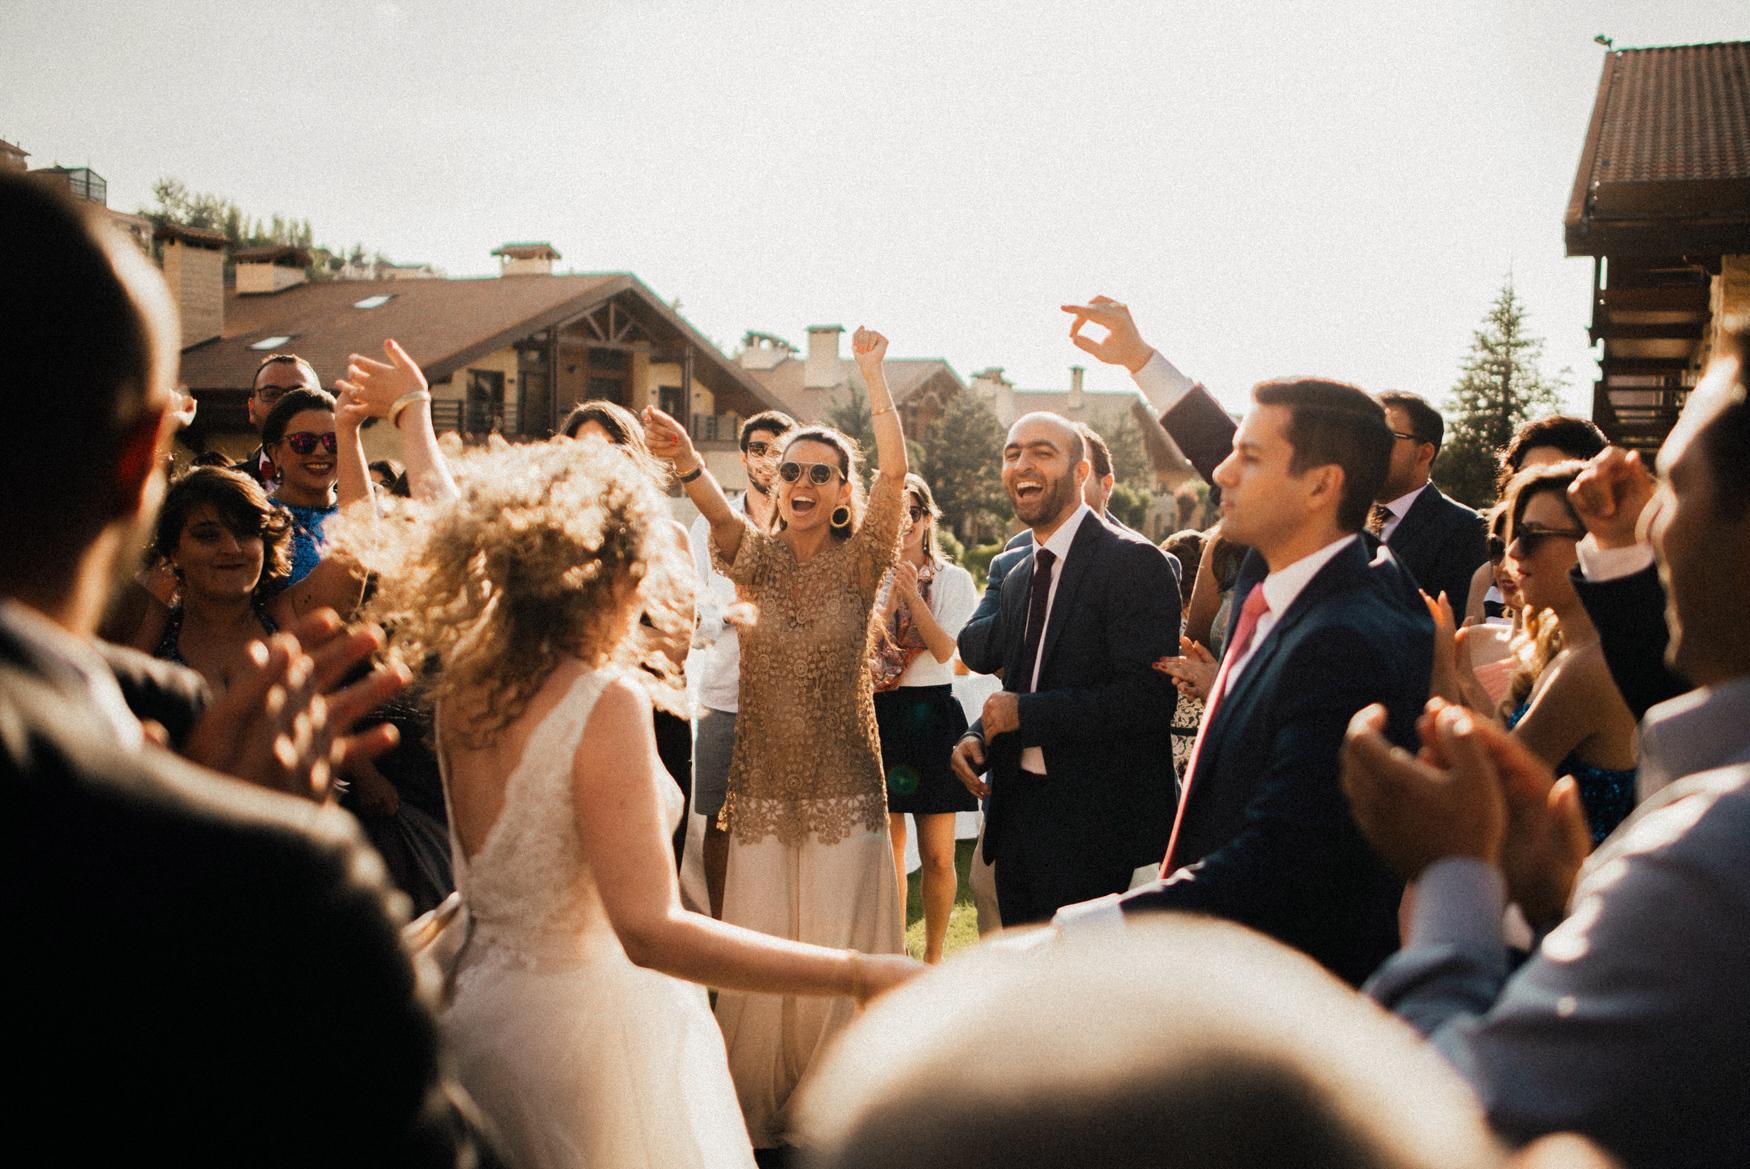 LR5 beirut lebanon mzaar intercontinental wedding photographer 006.jpg